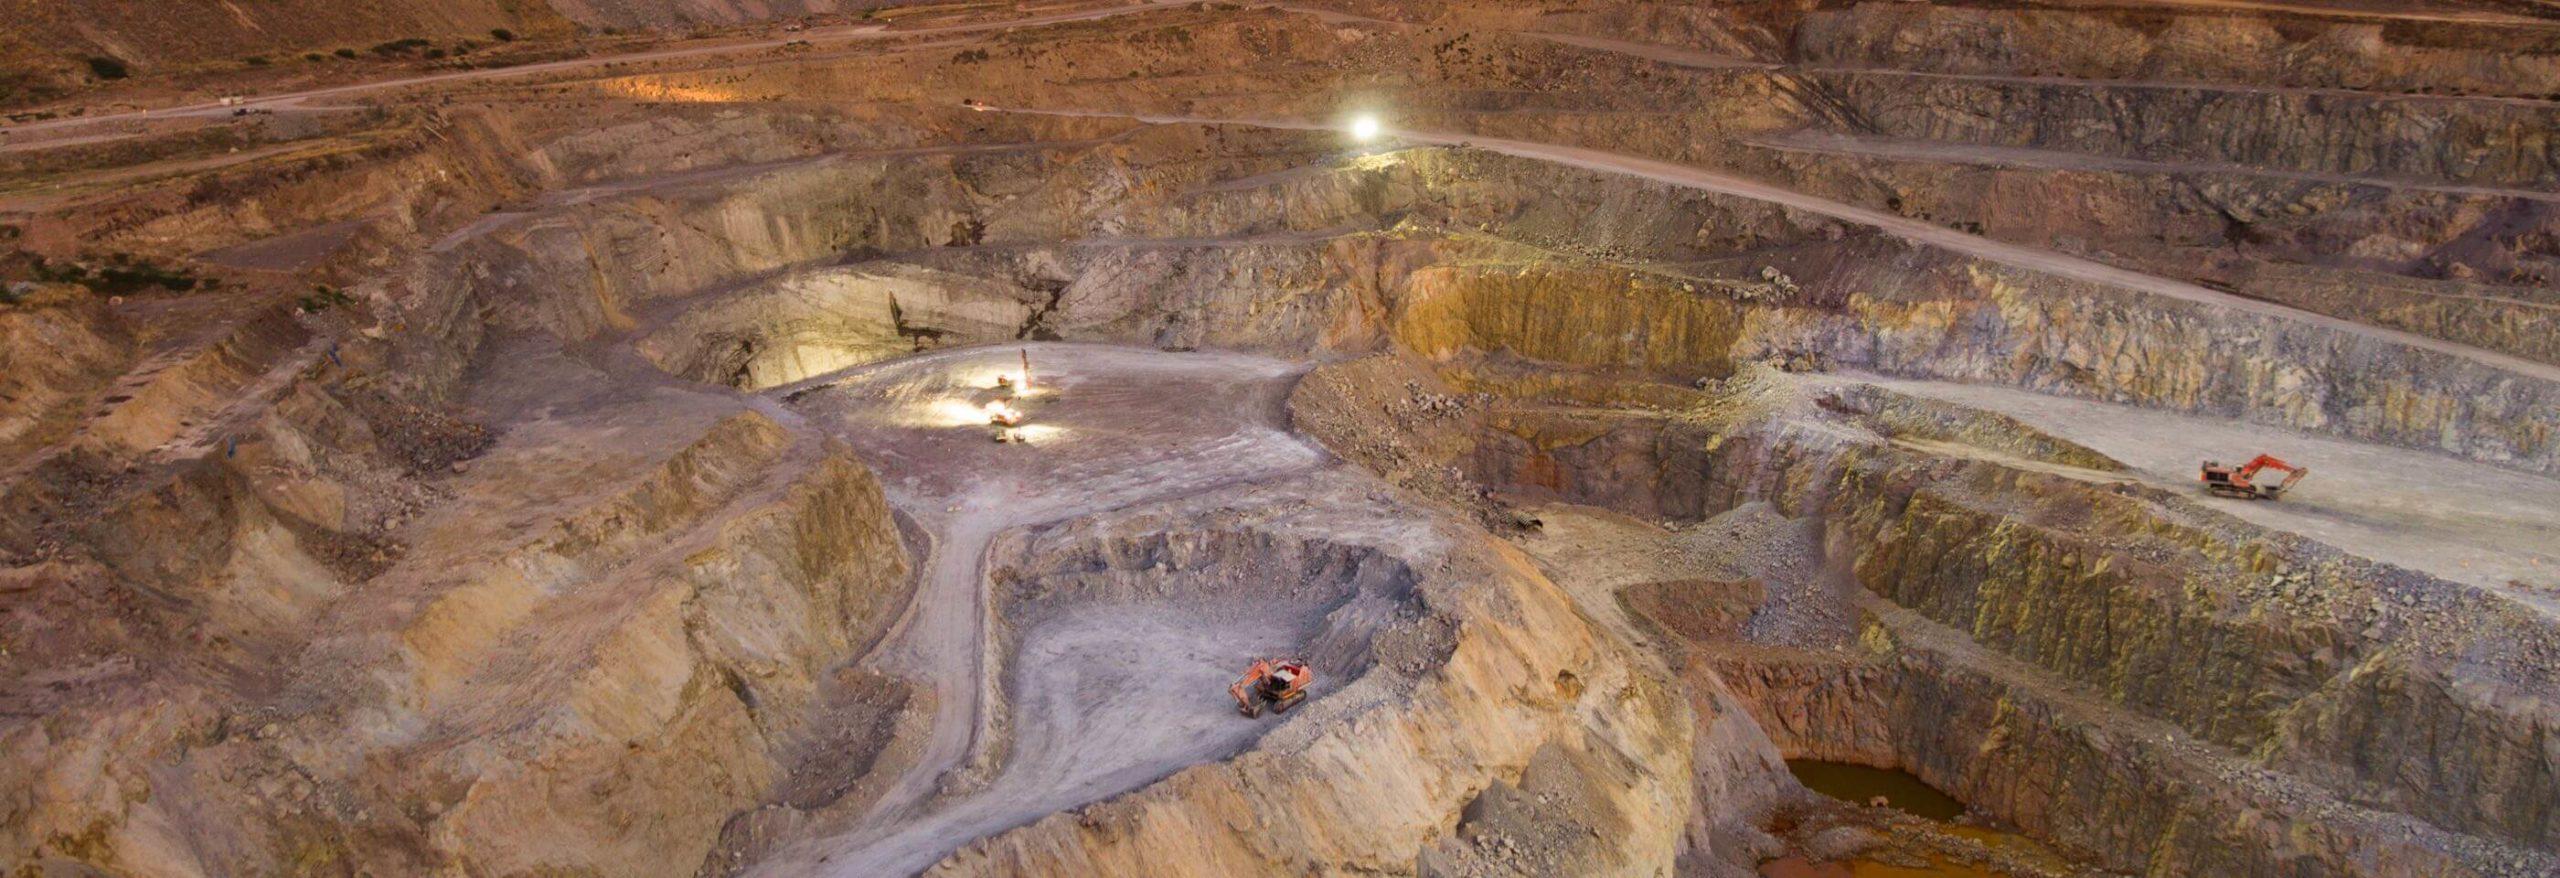 Mt Carlton in Queensland, Australia - Evolution Mining